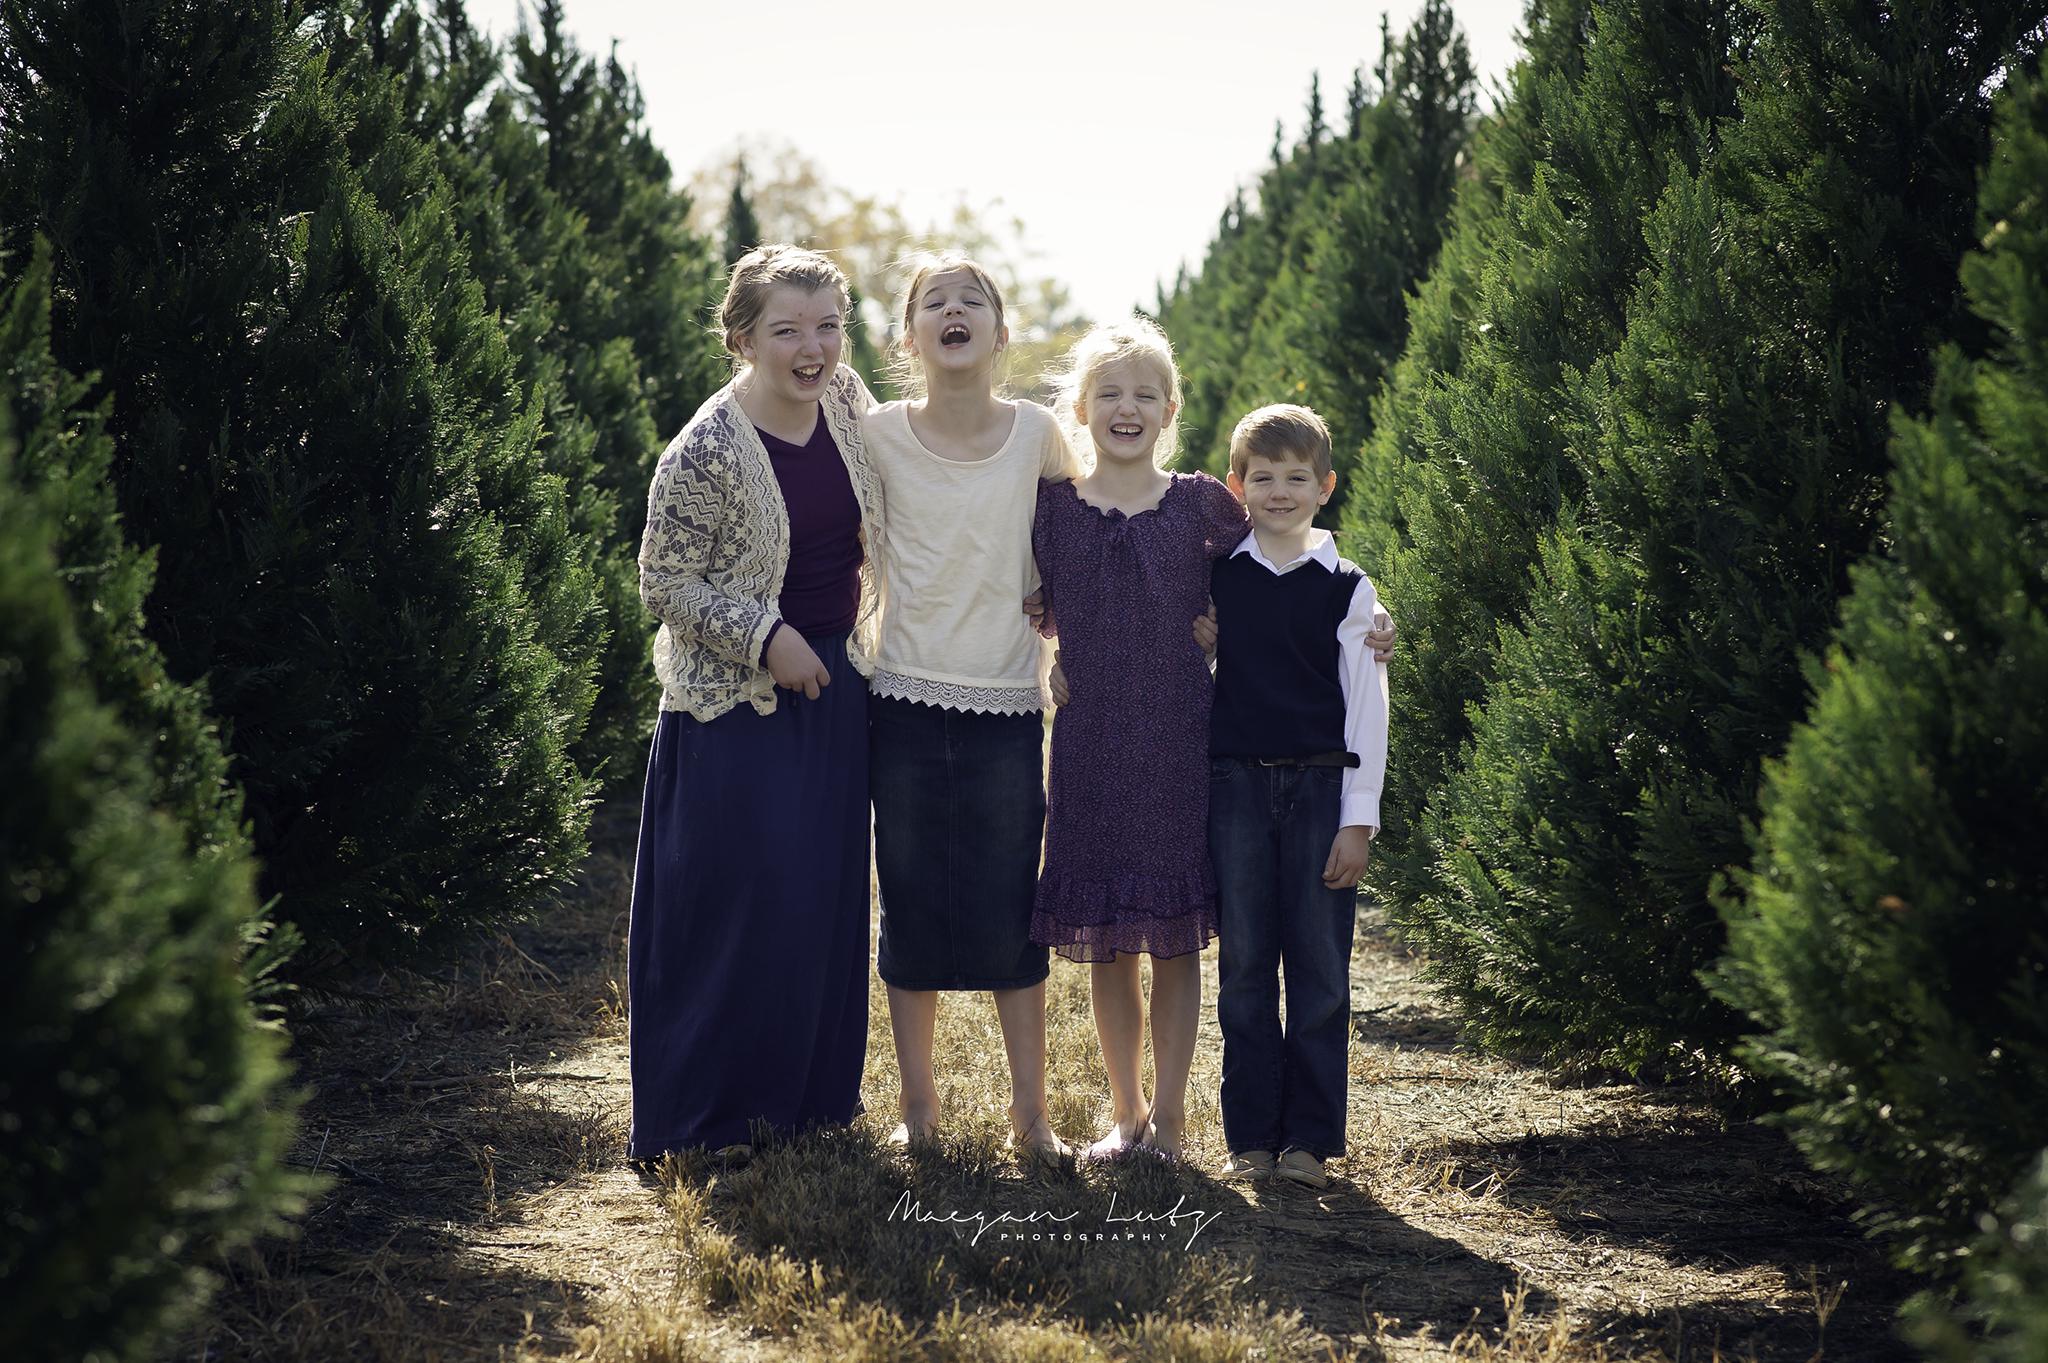 NEPA Northeast Pennsylvania family and portrait photographer